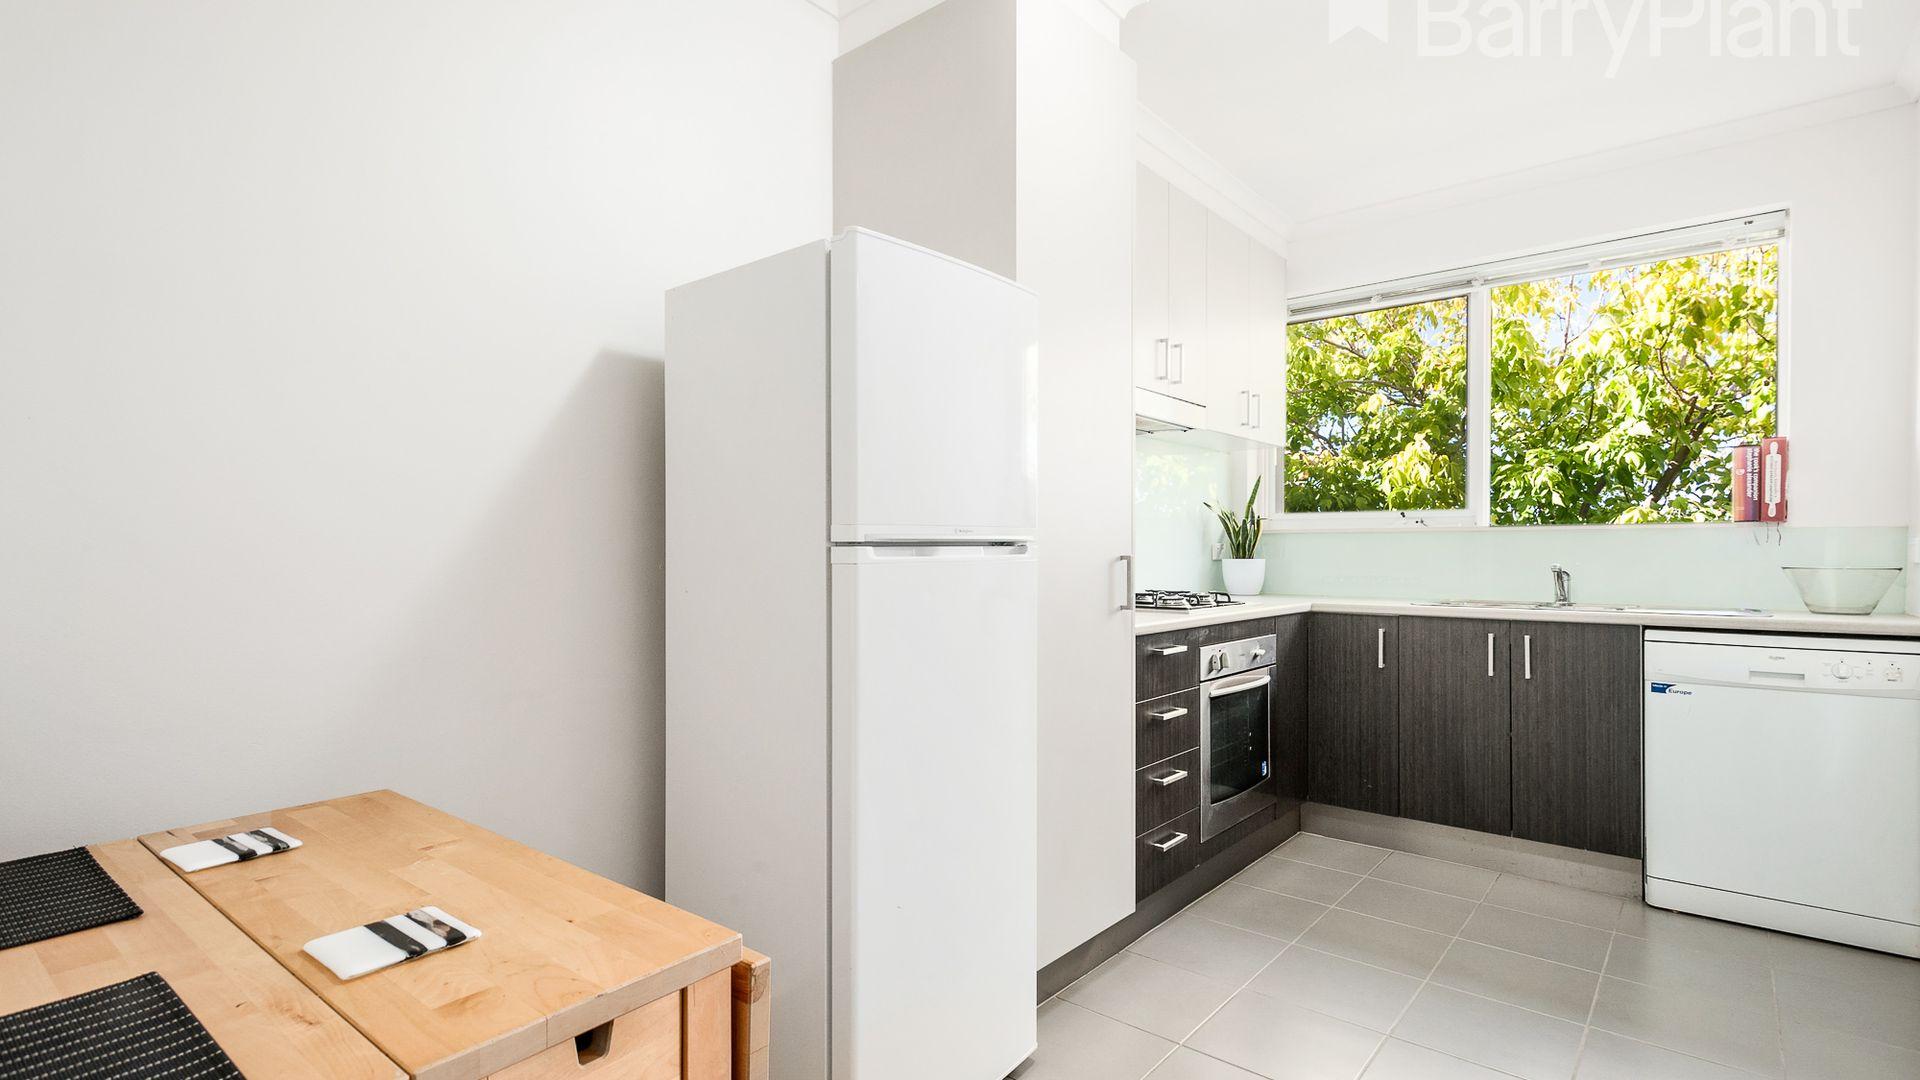 18/23 Baxter Street, Coburg VIC 3058, Image 1